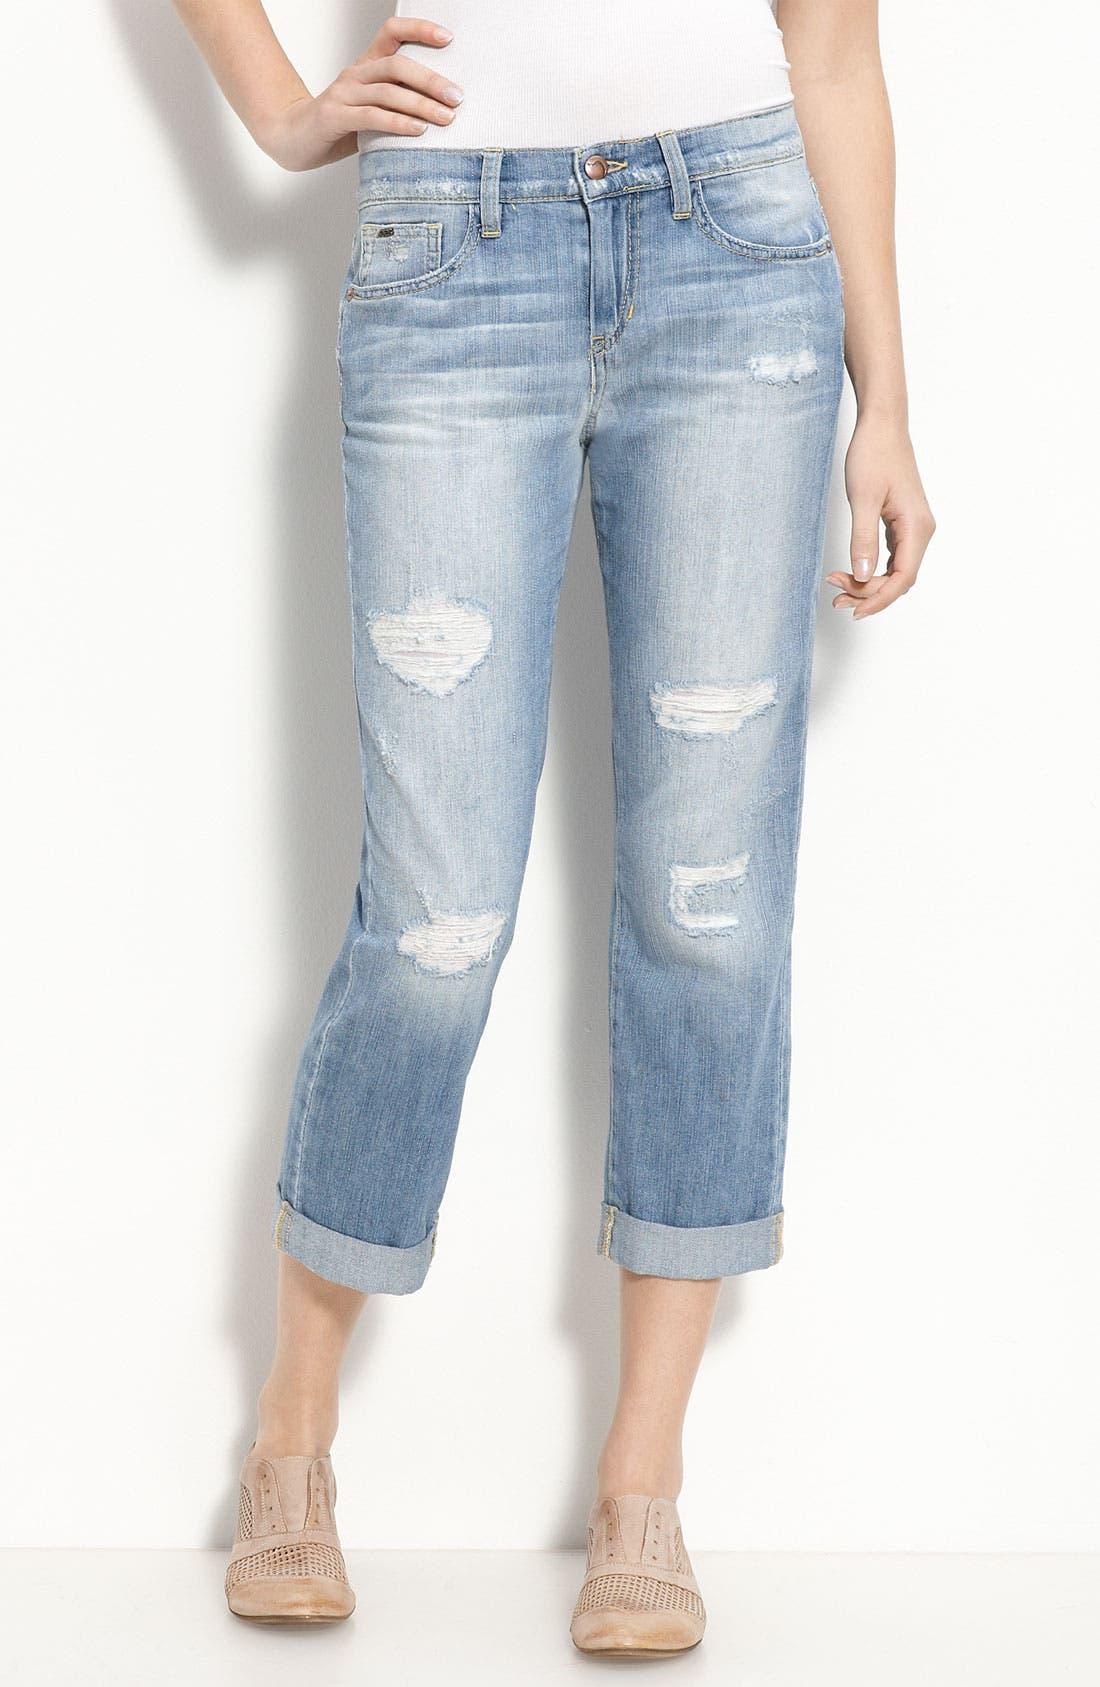 Alternate Image 1 Selected - Joe's 'Boyfriend Kicker' Crop Jeans (Patricia Wash)